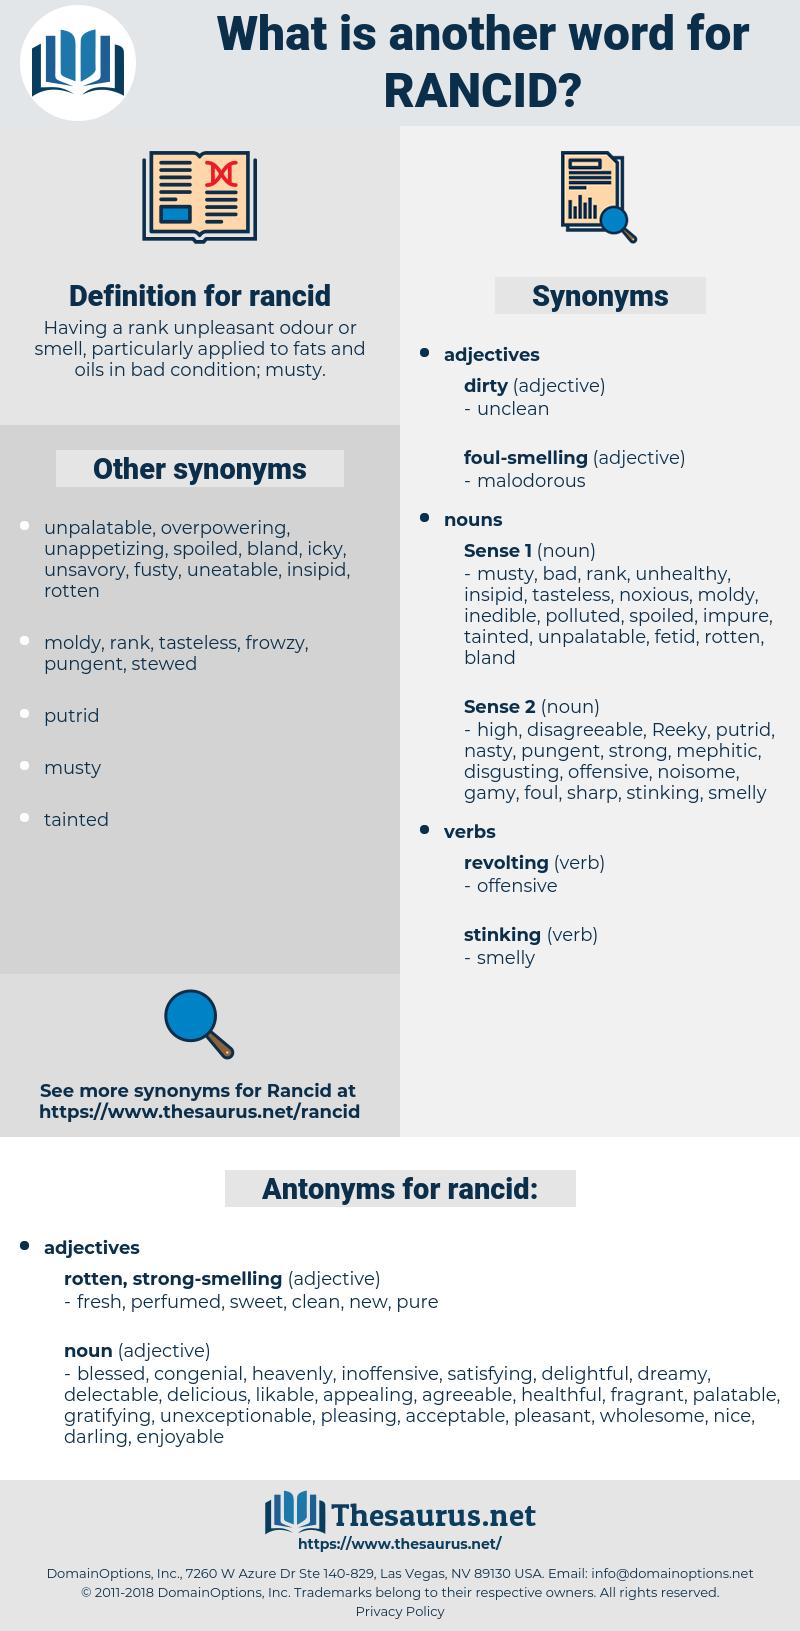 rancid, synonym rancid, another word for rancid, words like rancid, thesaurus rancid